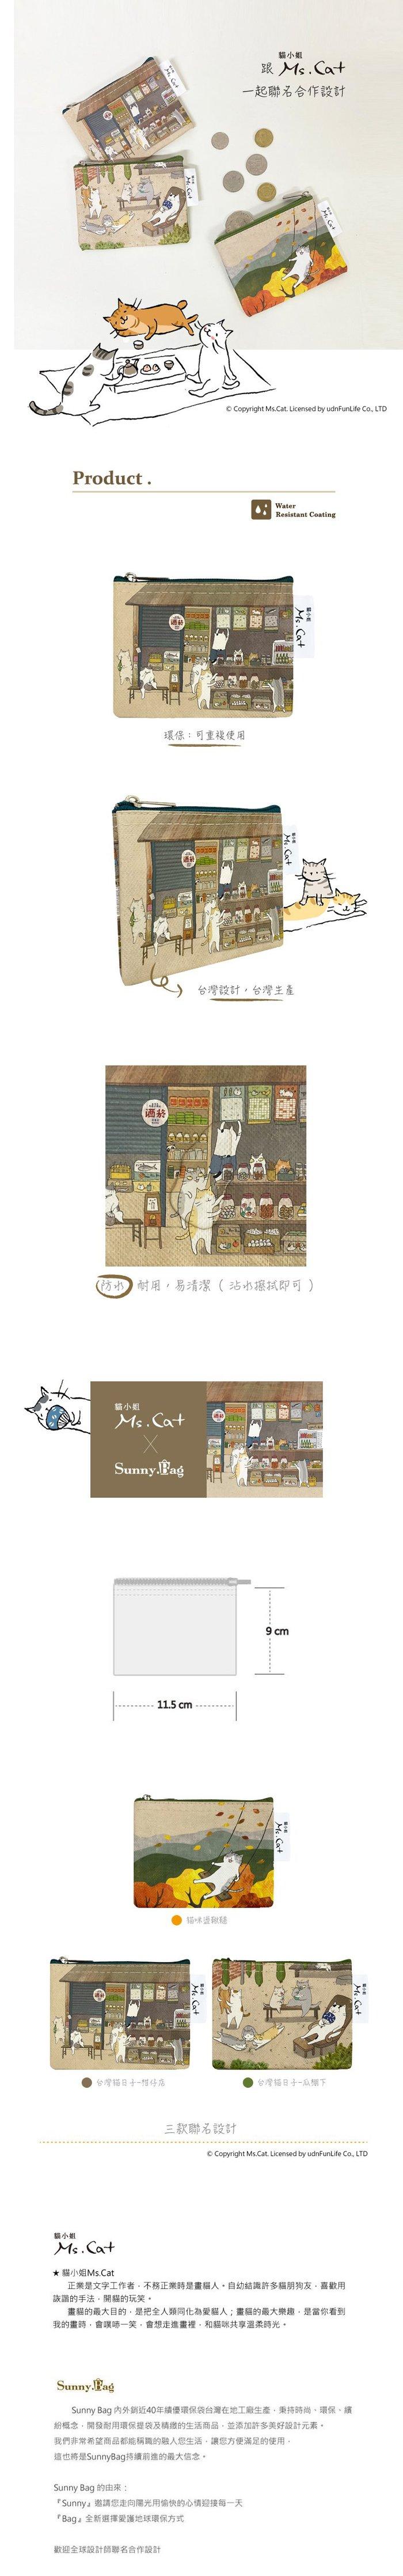 Sunny Bag x 貓小姐Ms.Cat-零錢包_台灣貓日子-柑仔店